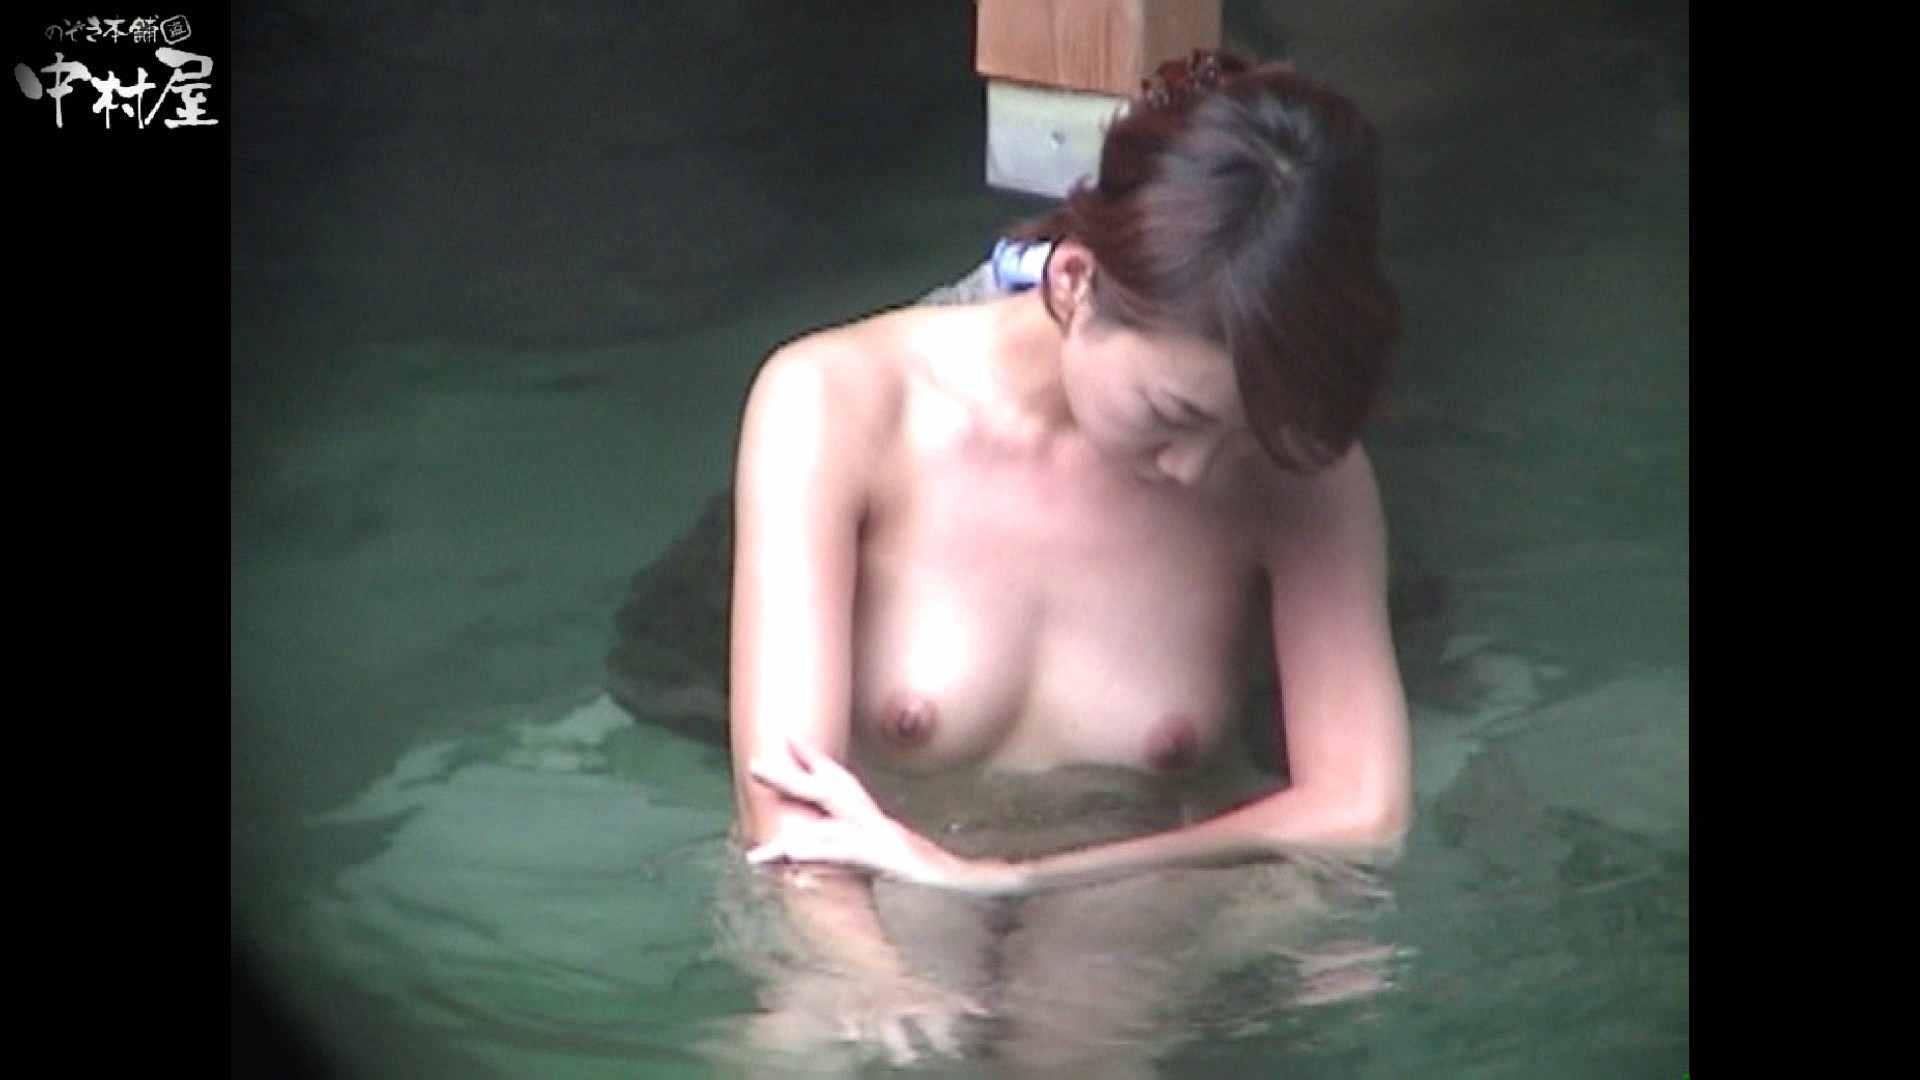 Aquaな露天風呂Vol.951 盗撮映像  93Pix 83